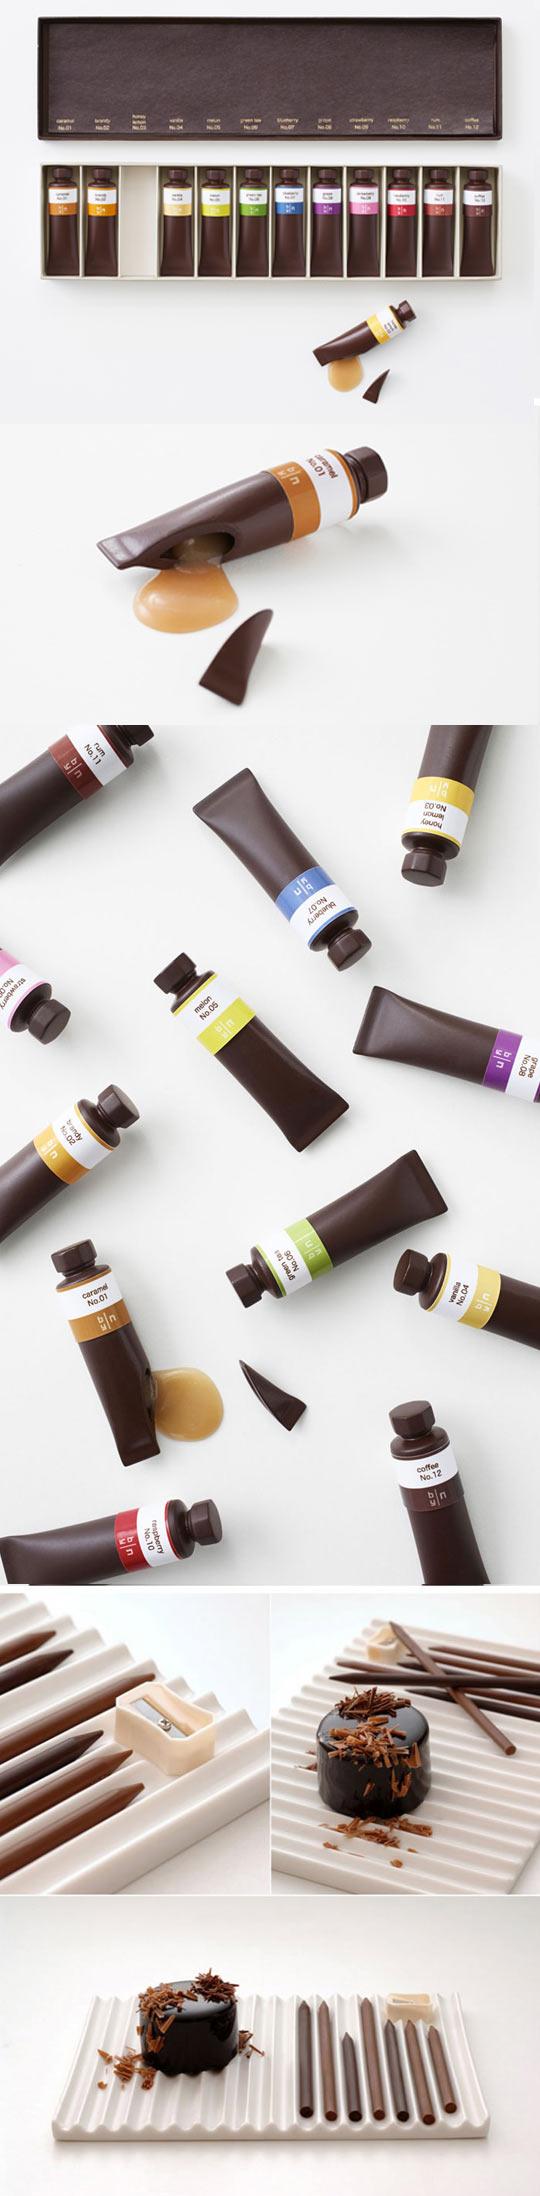 Edible Chocolate Art Supplies, I Need This